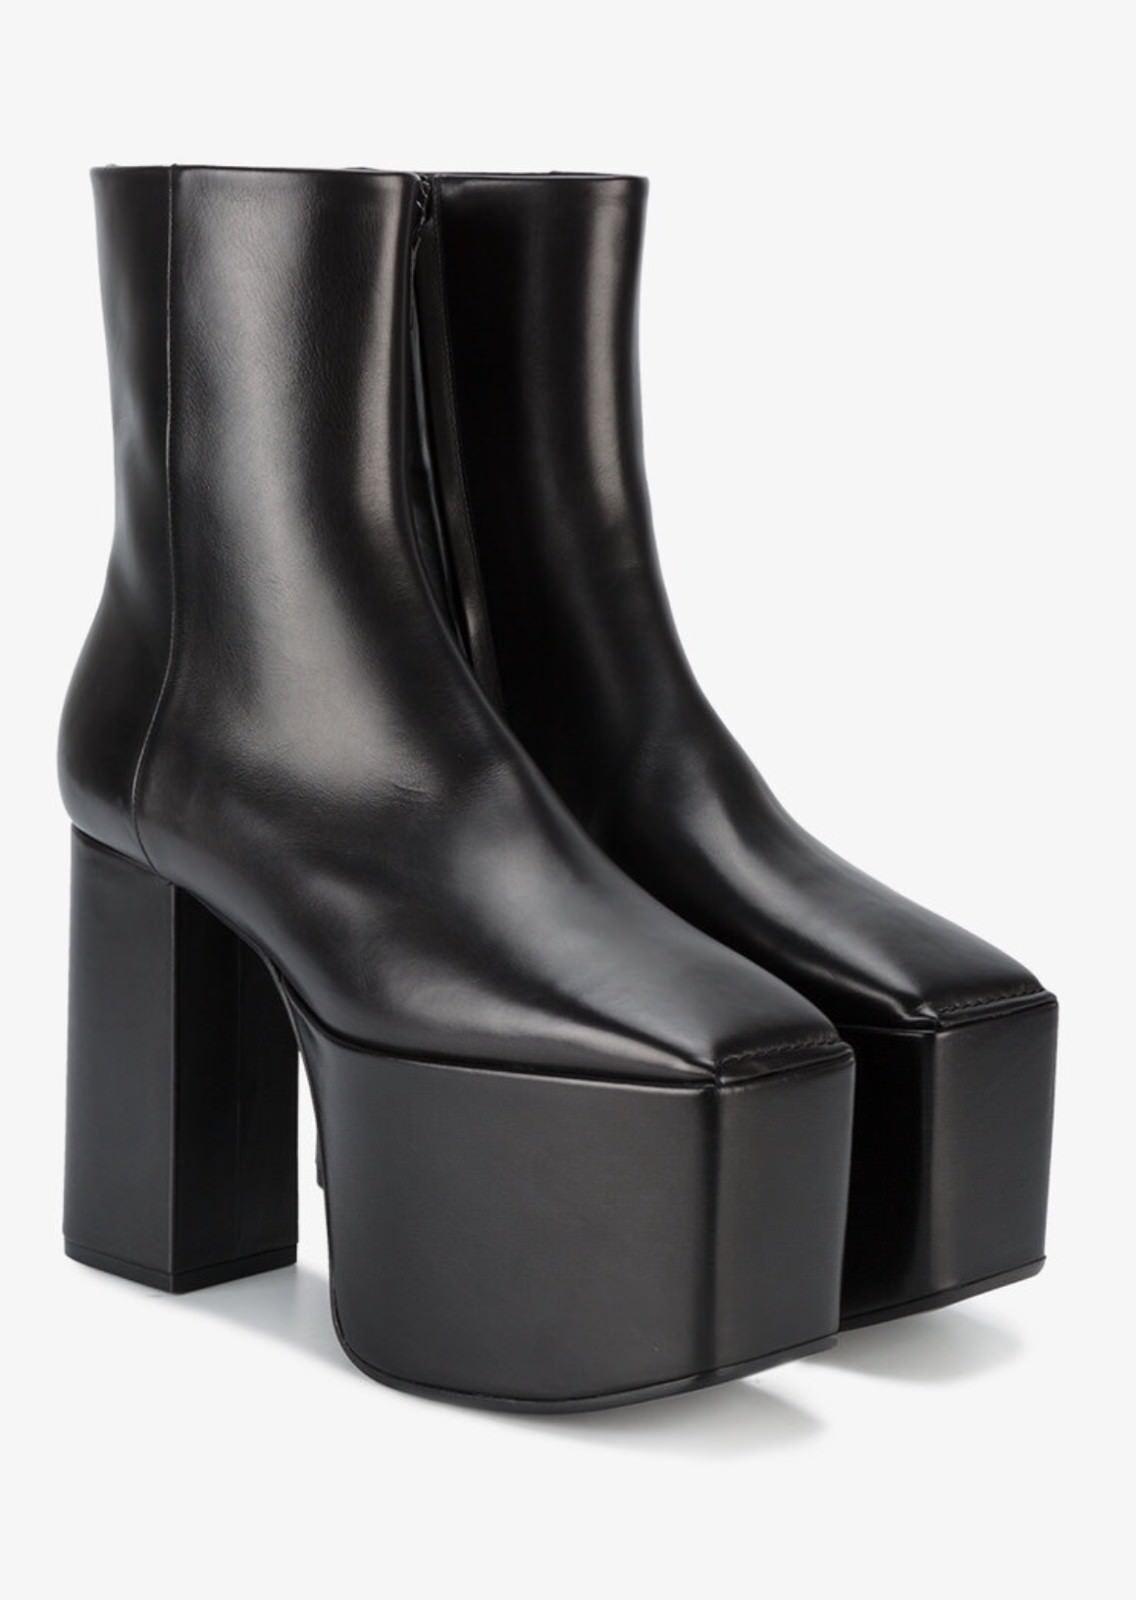 Balenciaga Black Leather Platform Boots